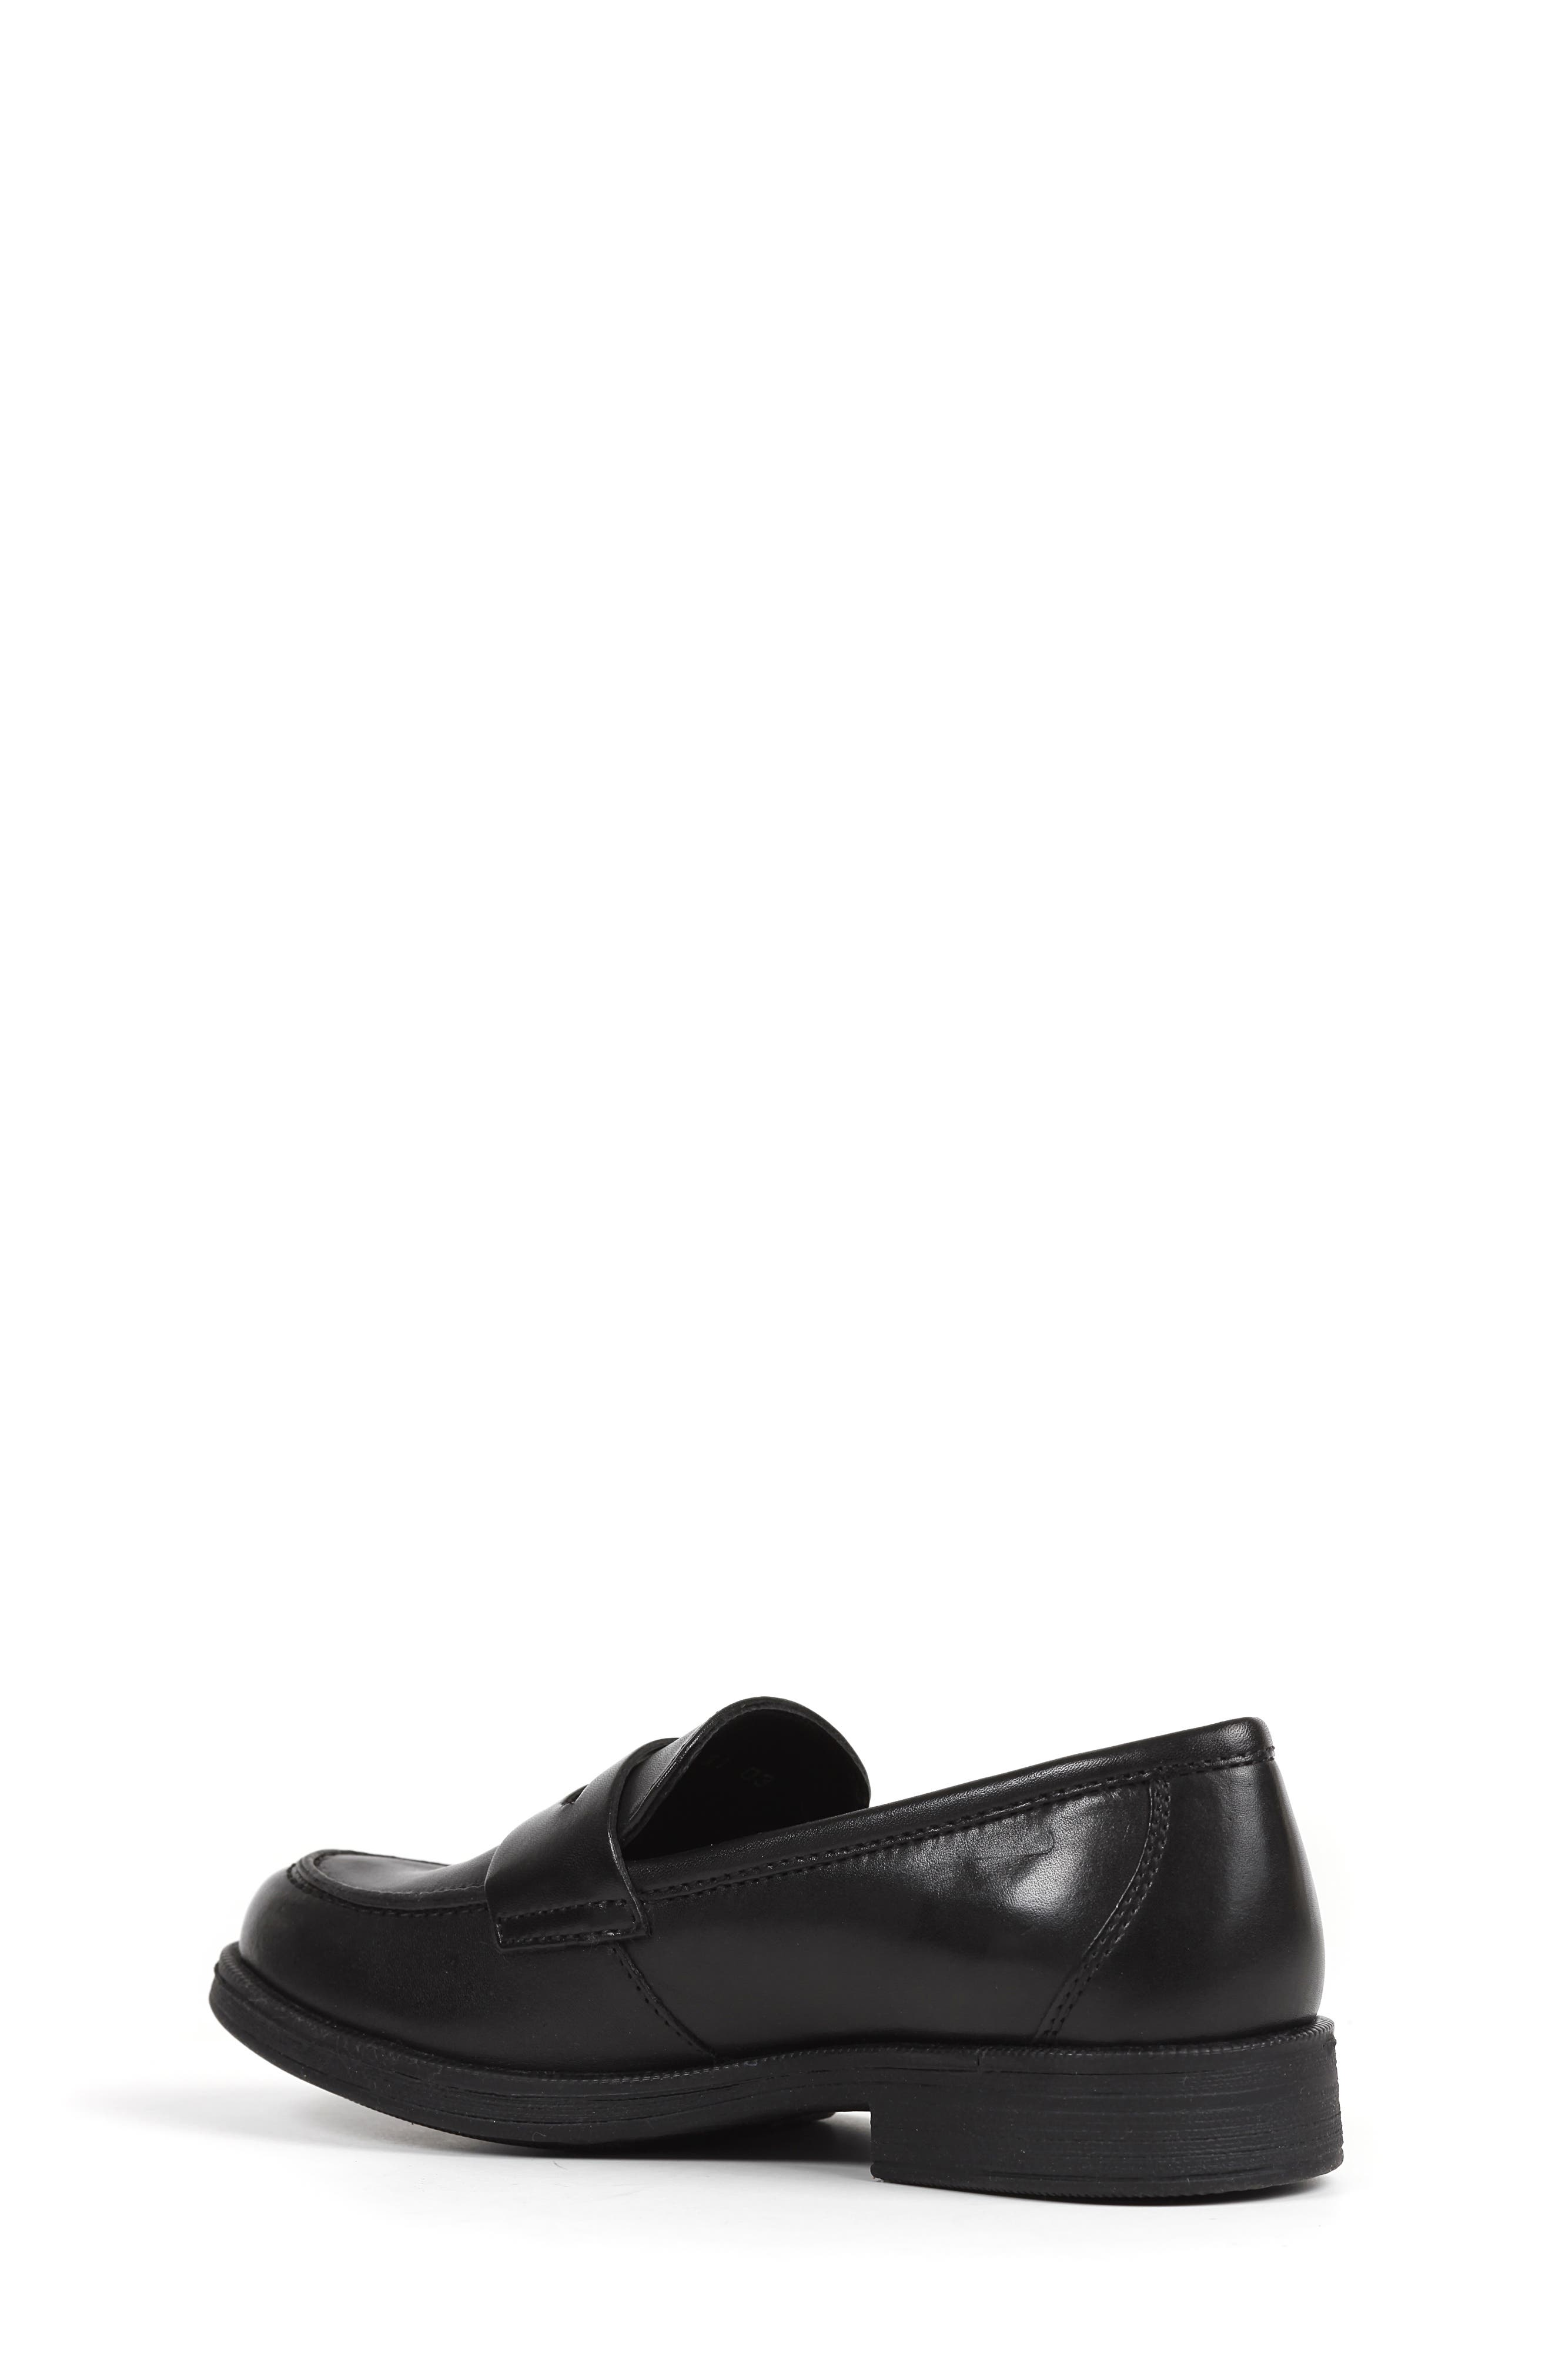 Agata 1 Penny Loafer,                             Alternate thumbnail 2, color,                             BLACK